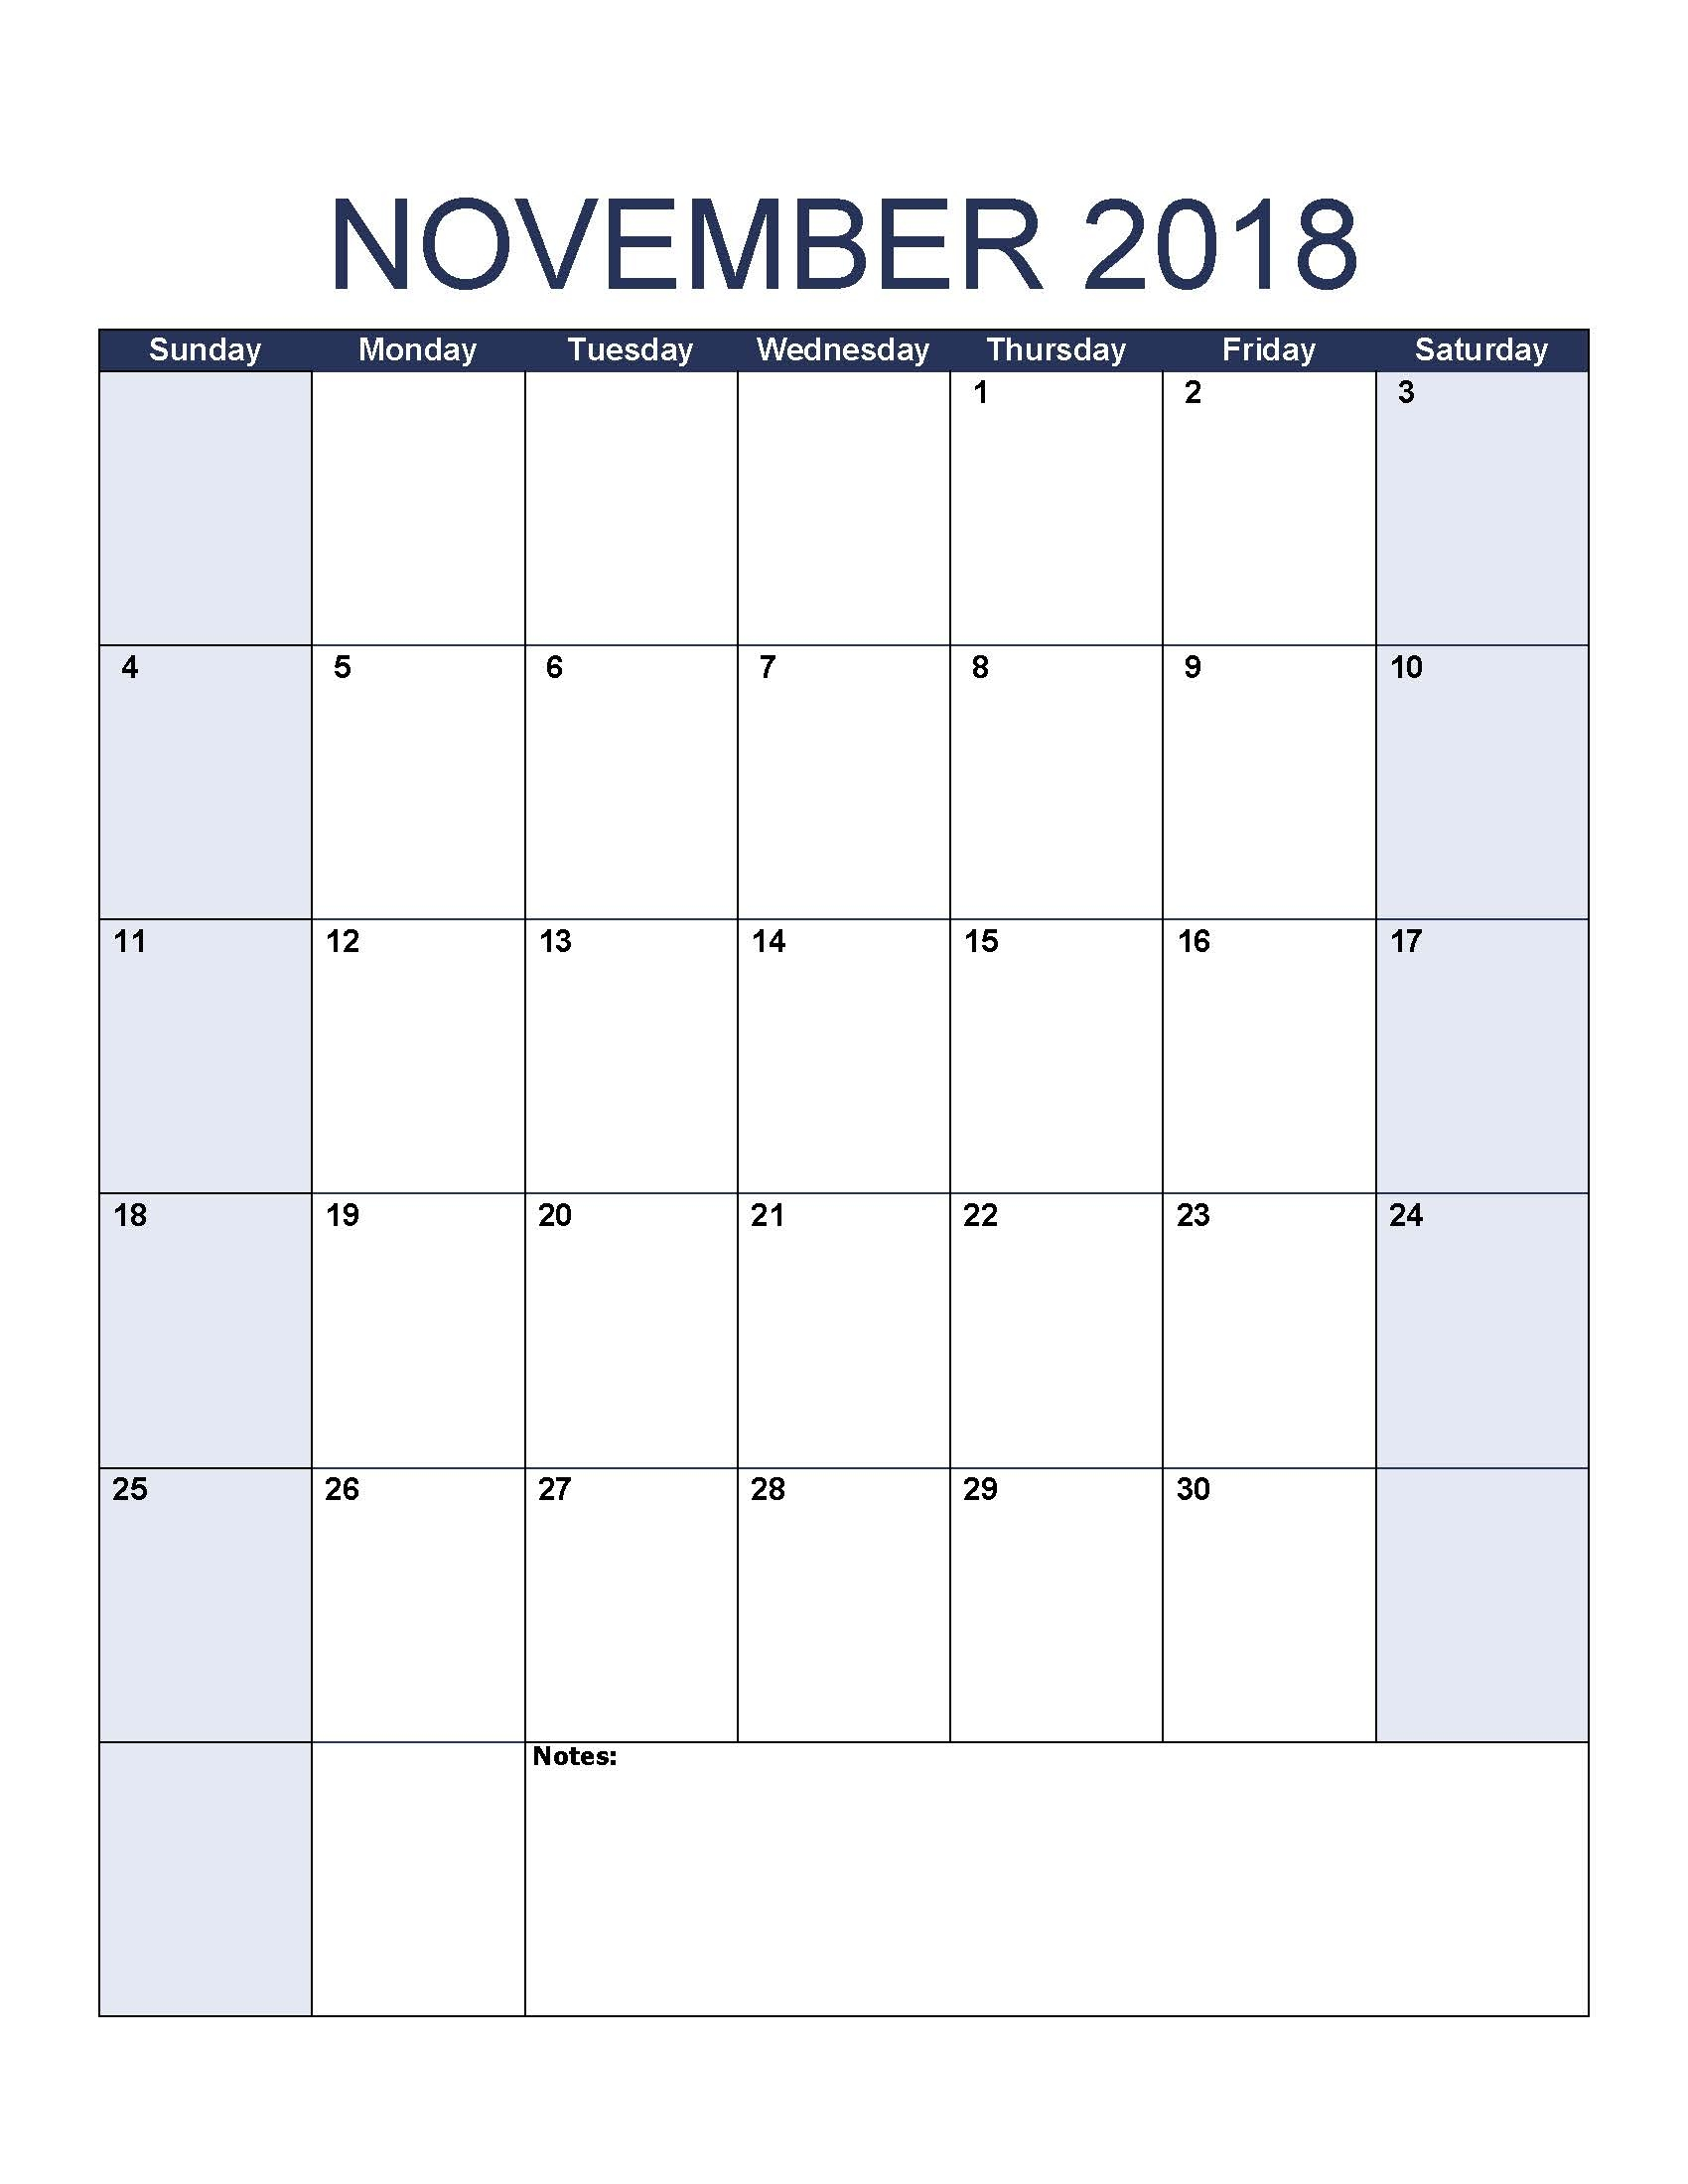 blank november 2018 calendar to print::November 2018 Calendar